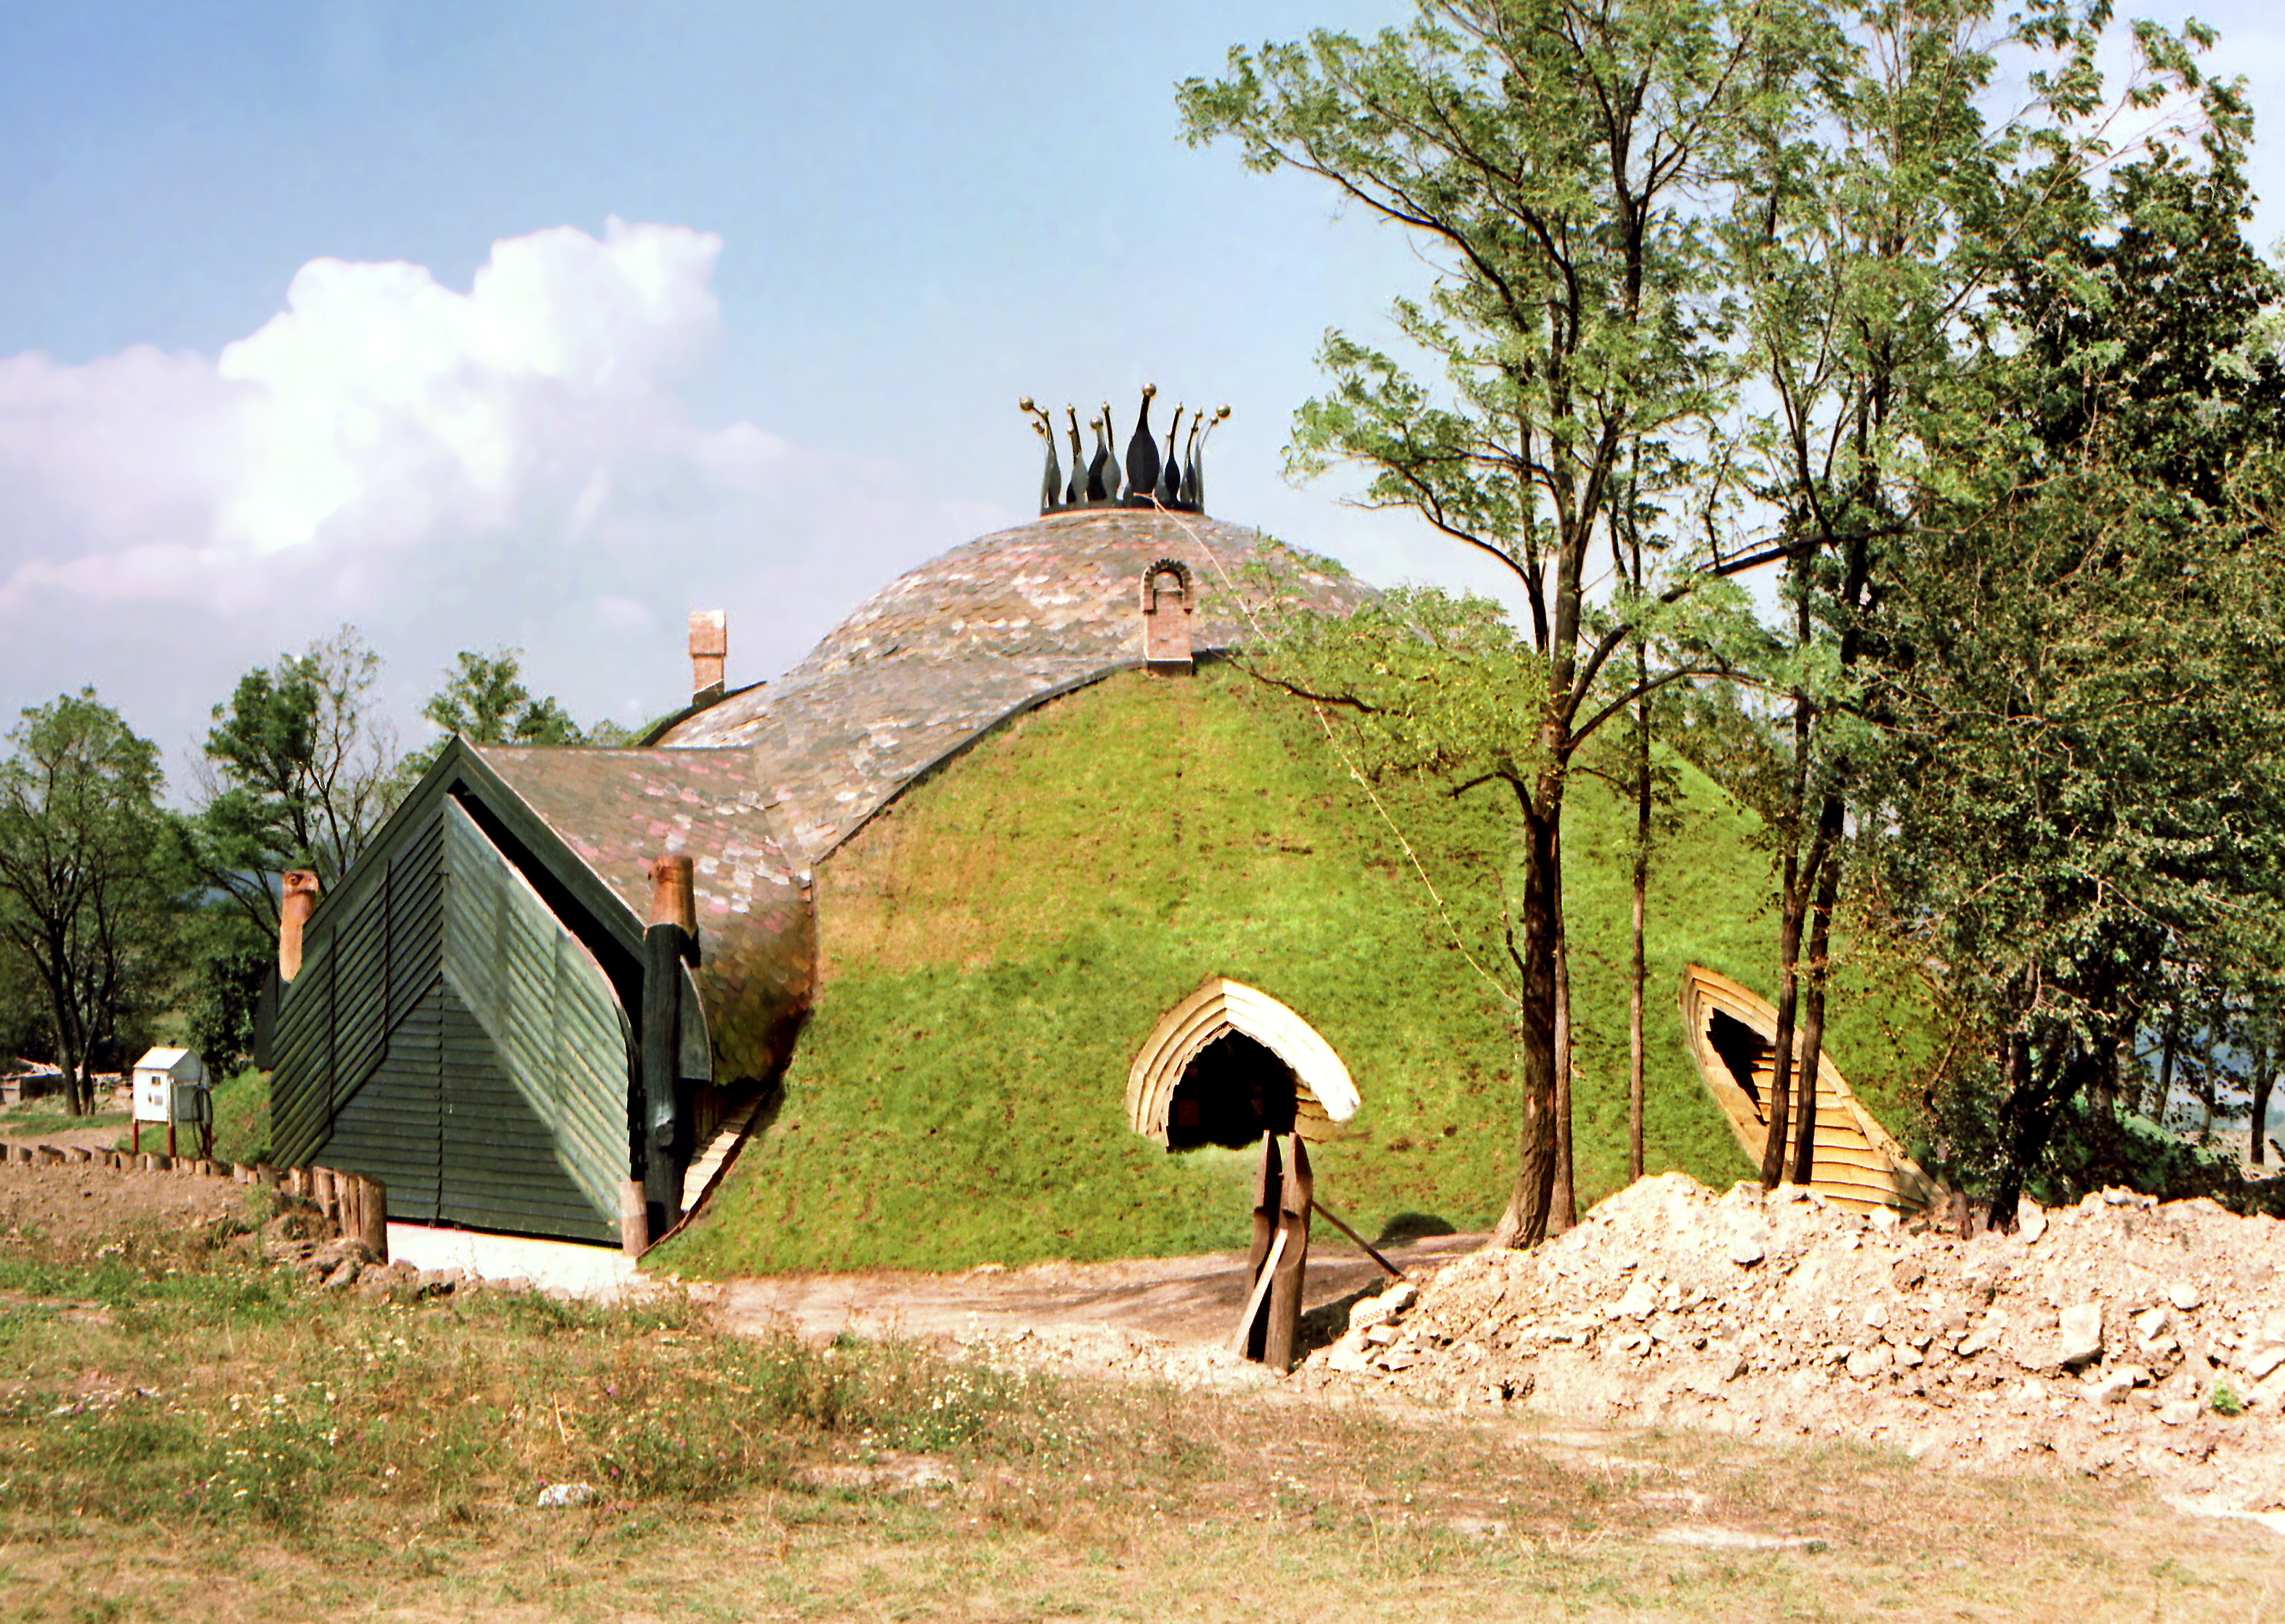 Pilisi Parkerdö (Visegrád, Ungarn): Grashaus. Architekt Imre Makovecz (1984)